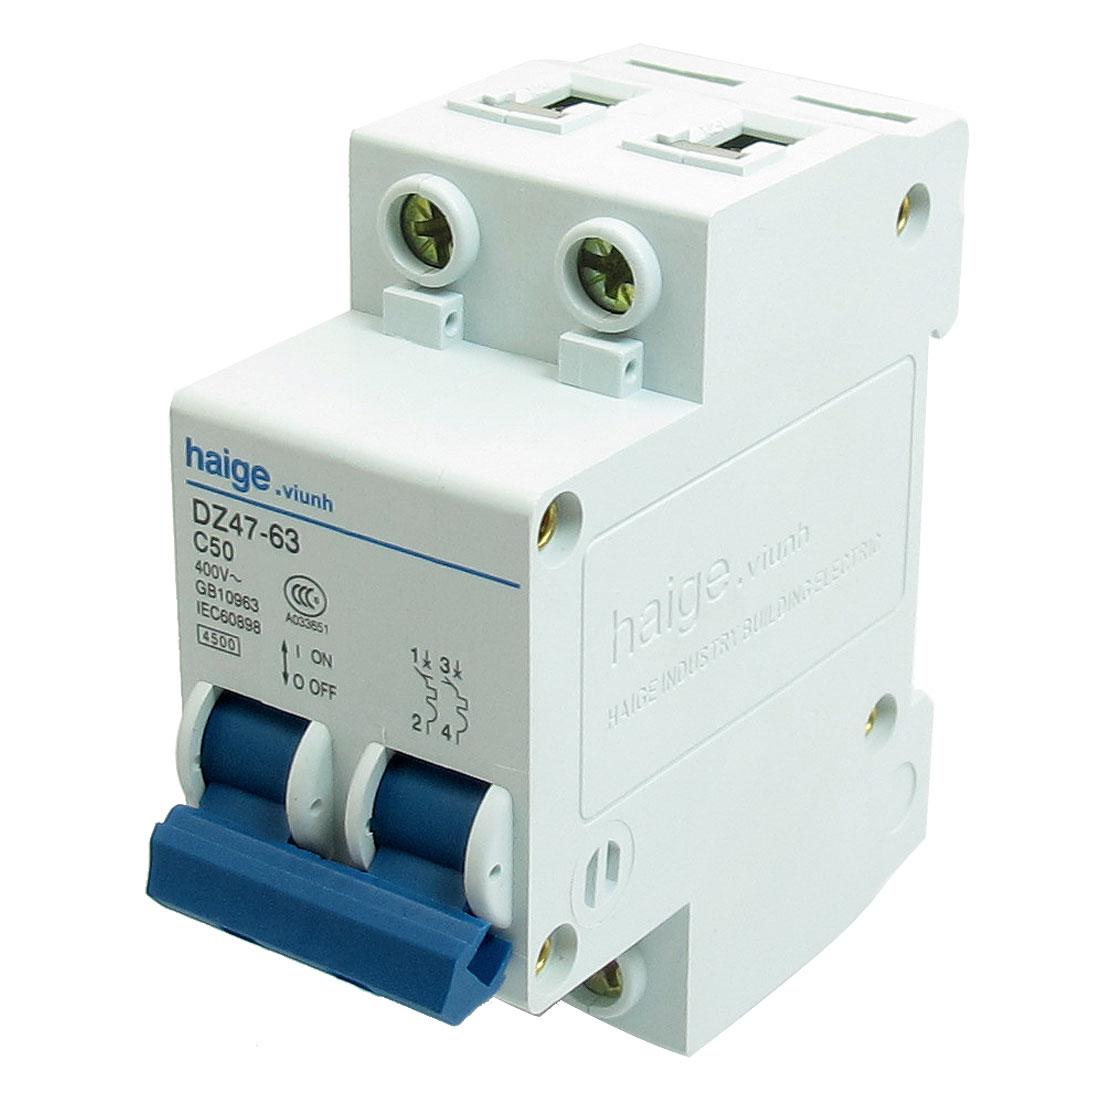 AC 400V 50A 4500A 2 P MCB Miniature Circuit Breaker DZ47-63 C50